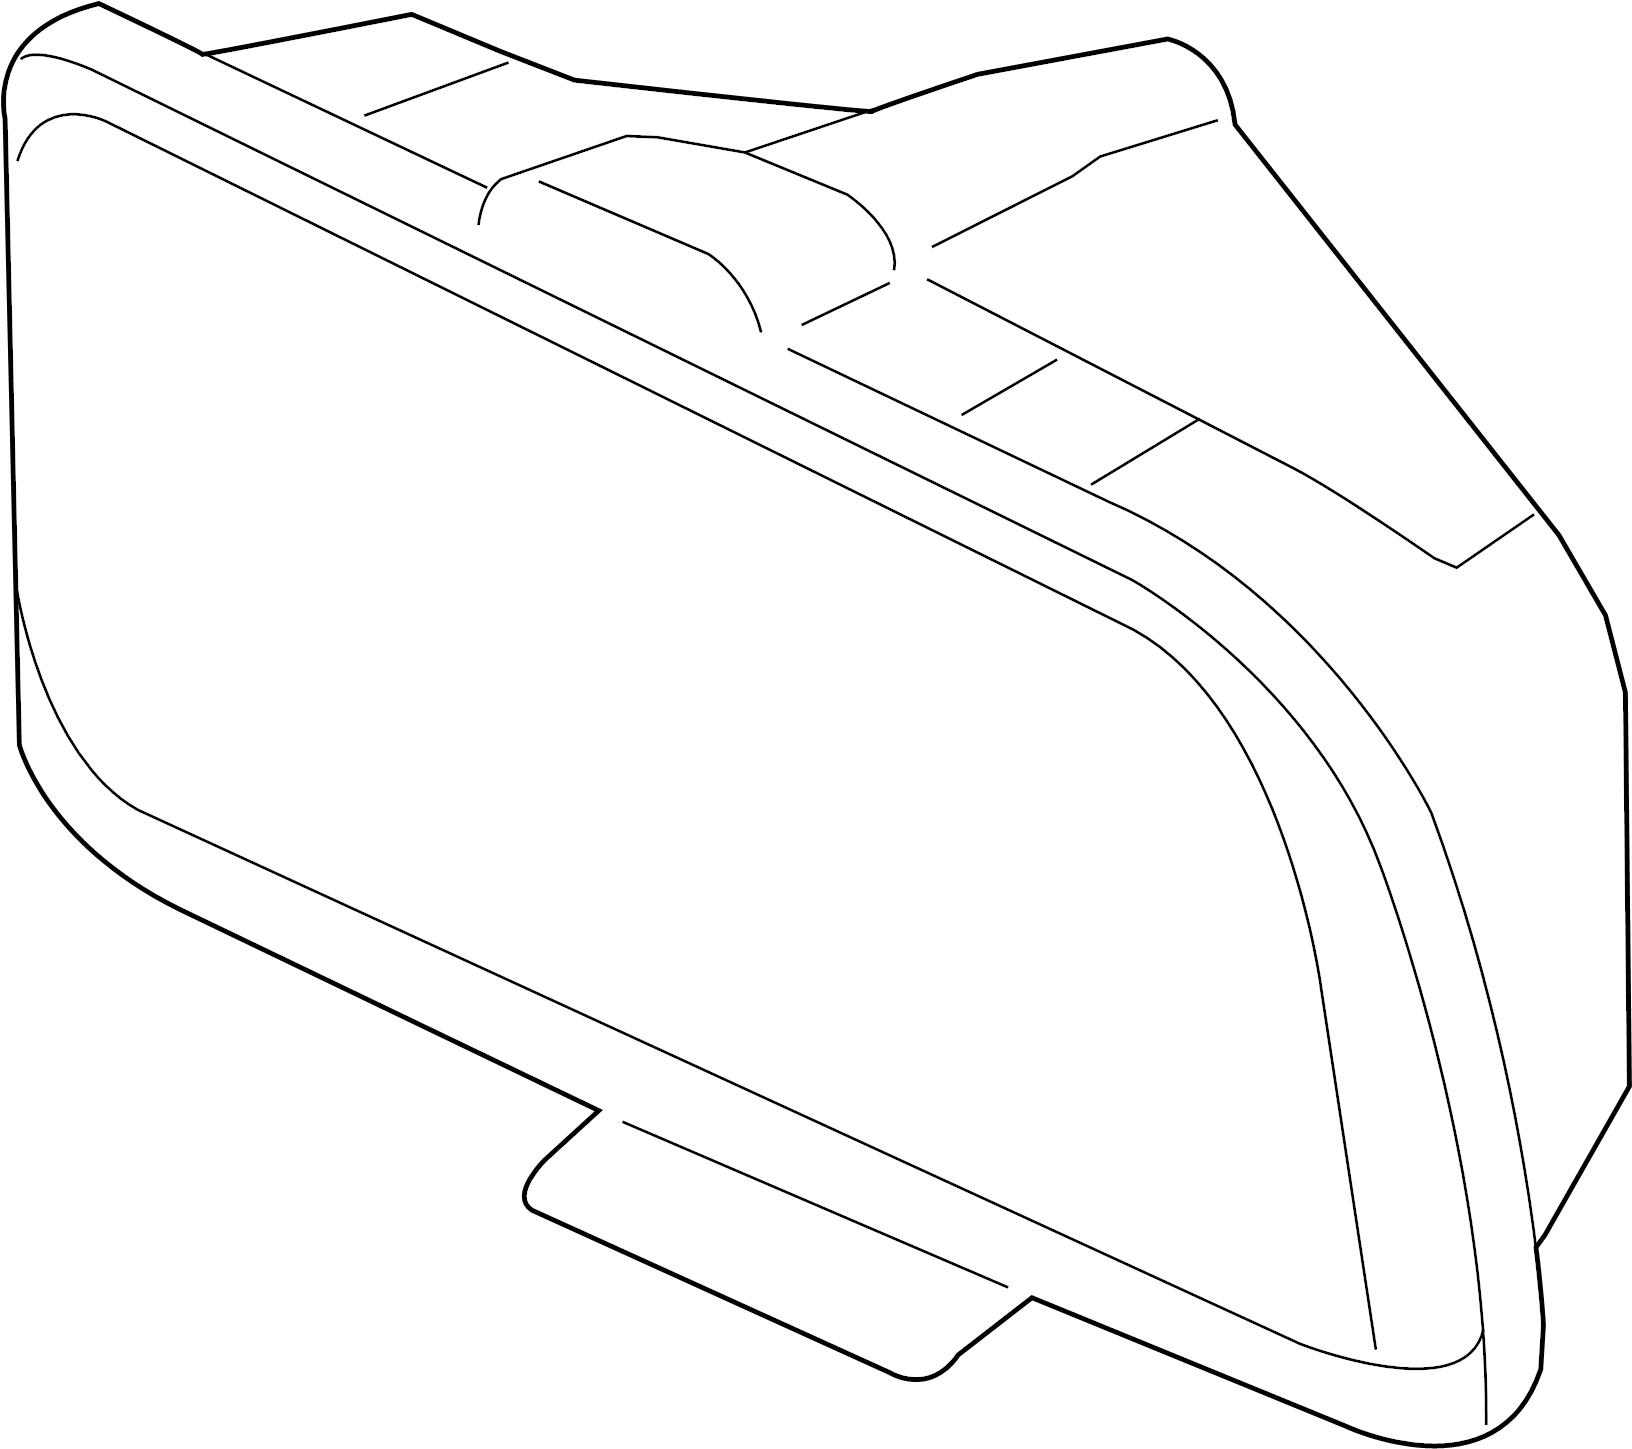 Ford Mustang Headlight Mustang Right W Halogen